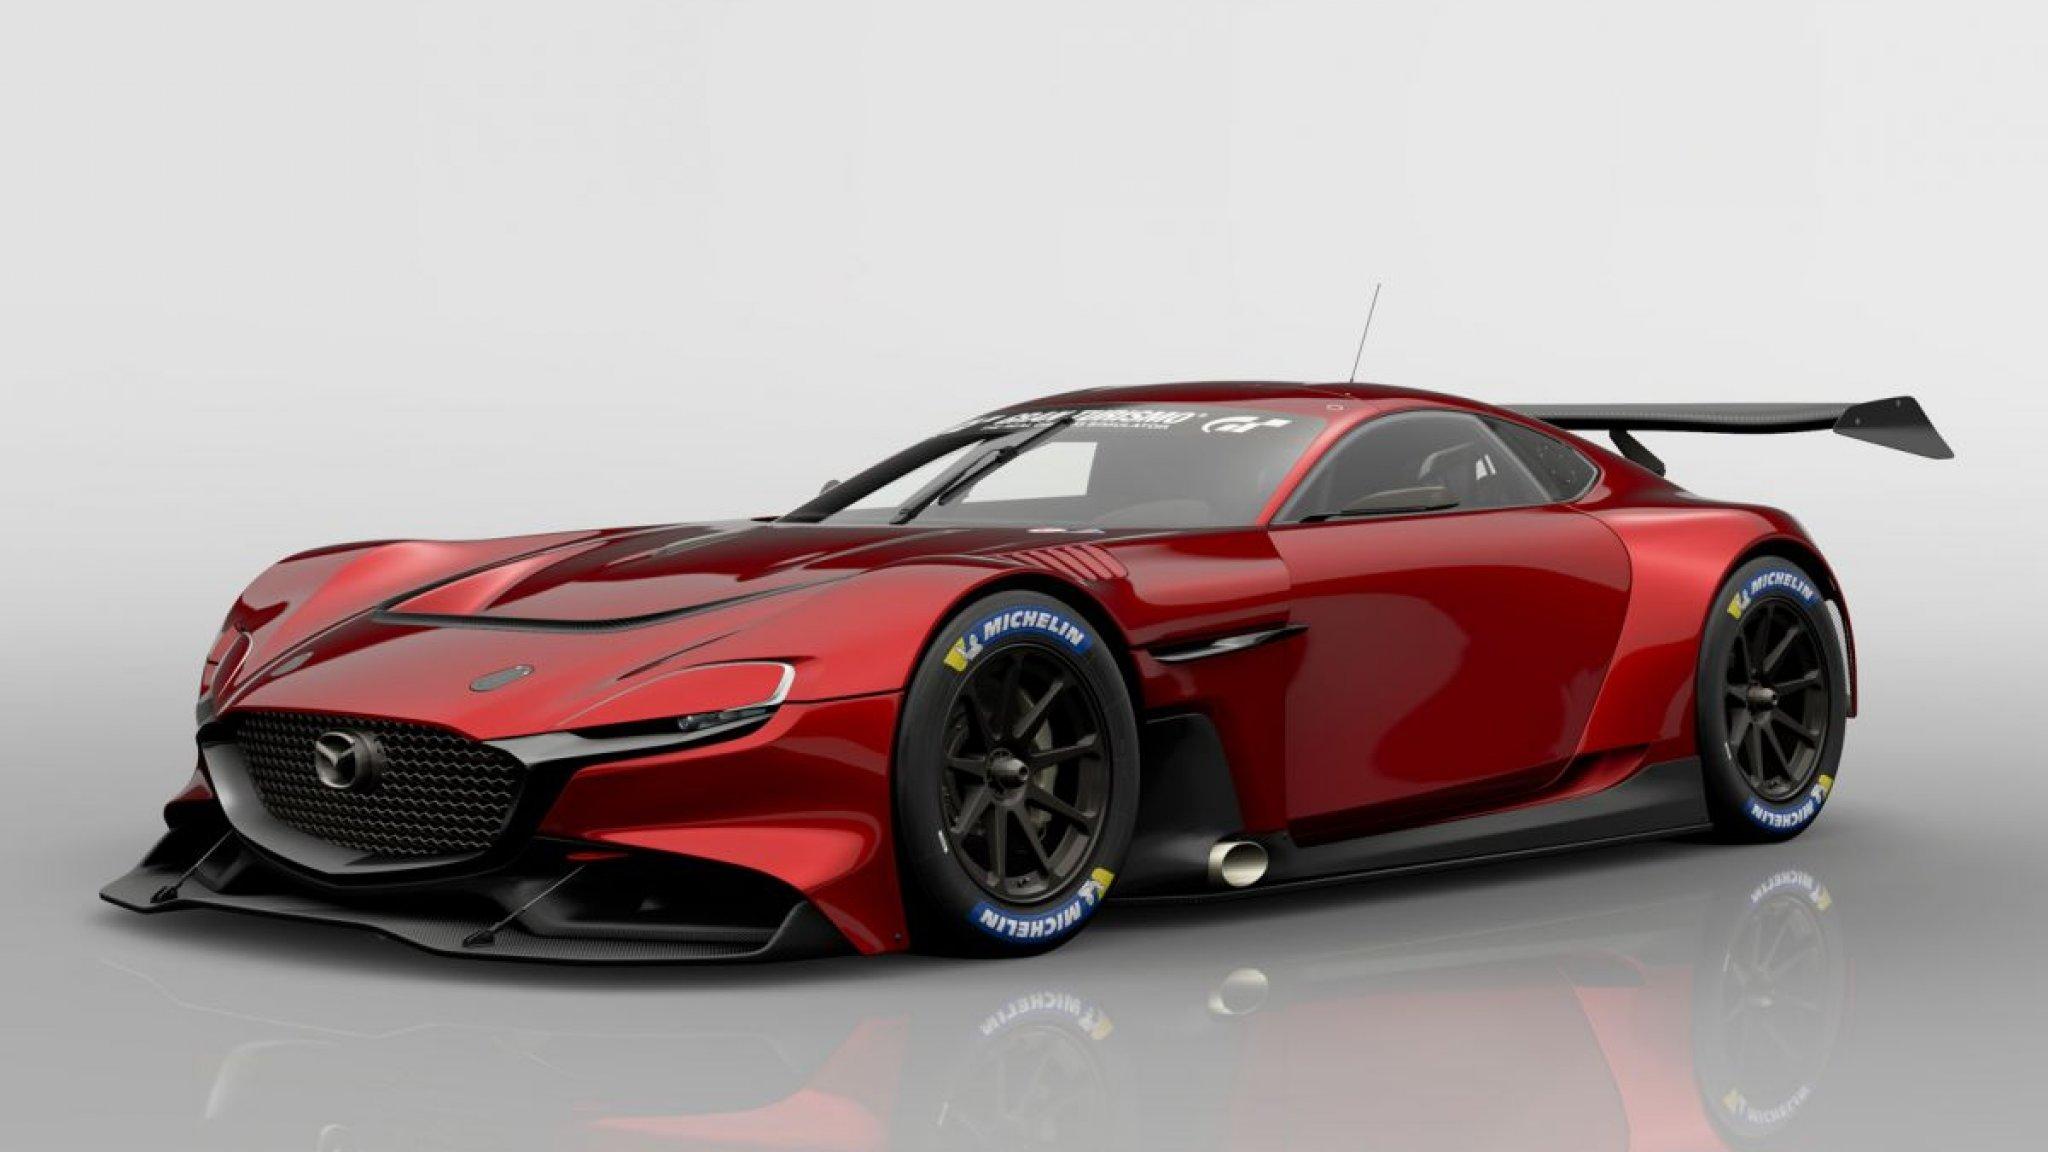 Kelebihan Kekurangan Mazda Rx Vision Top Model Tahun Ini